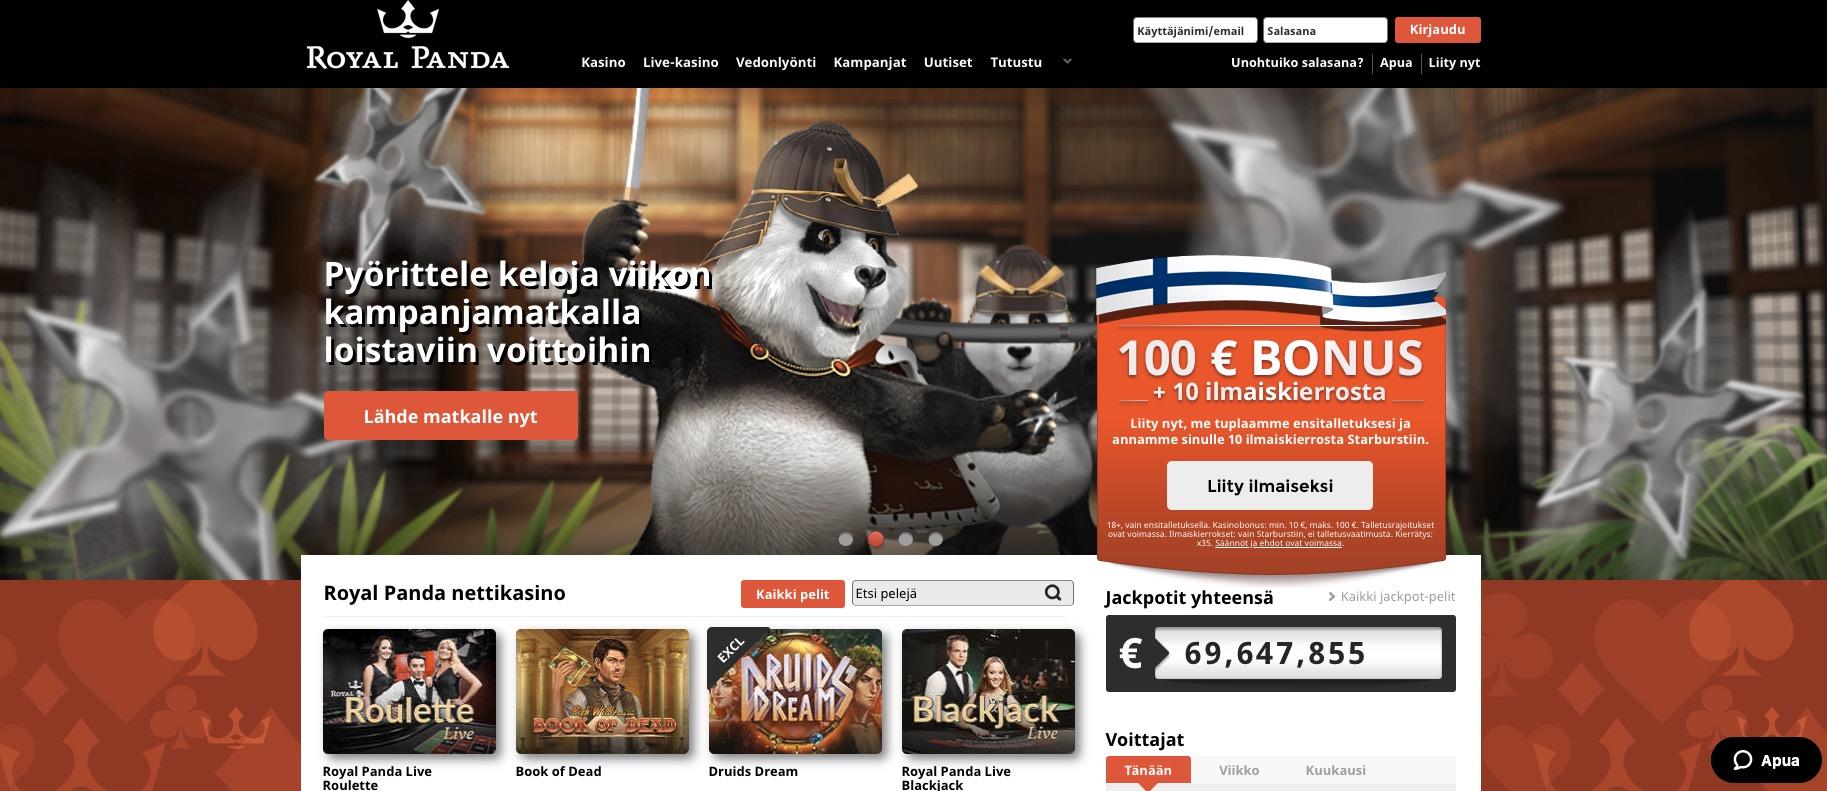 Royal Panda Casino etusivu